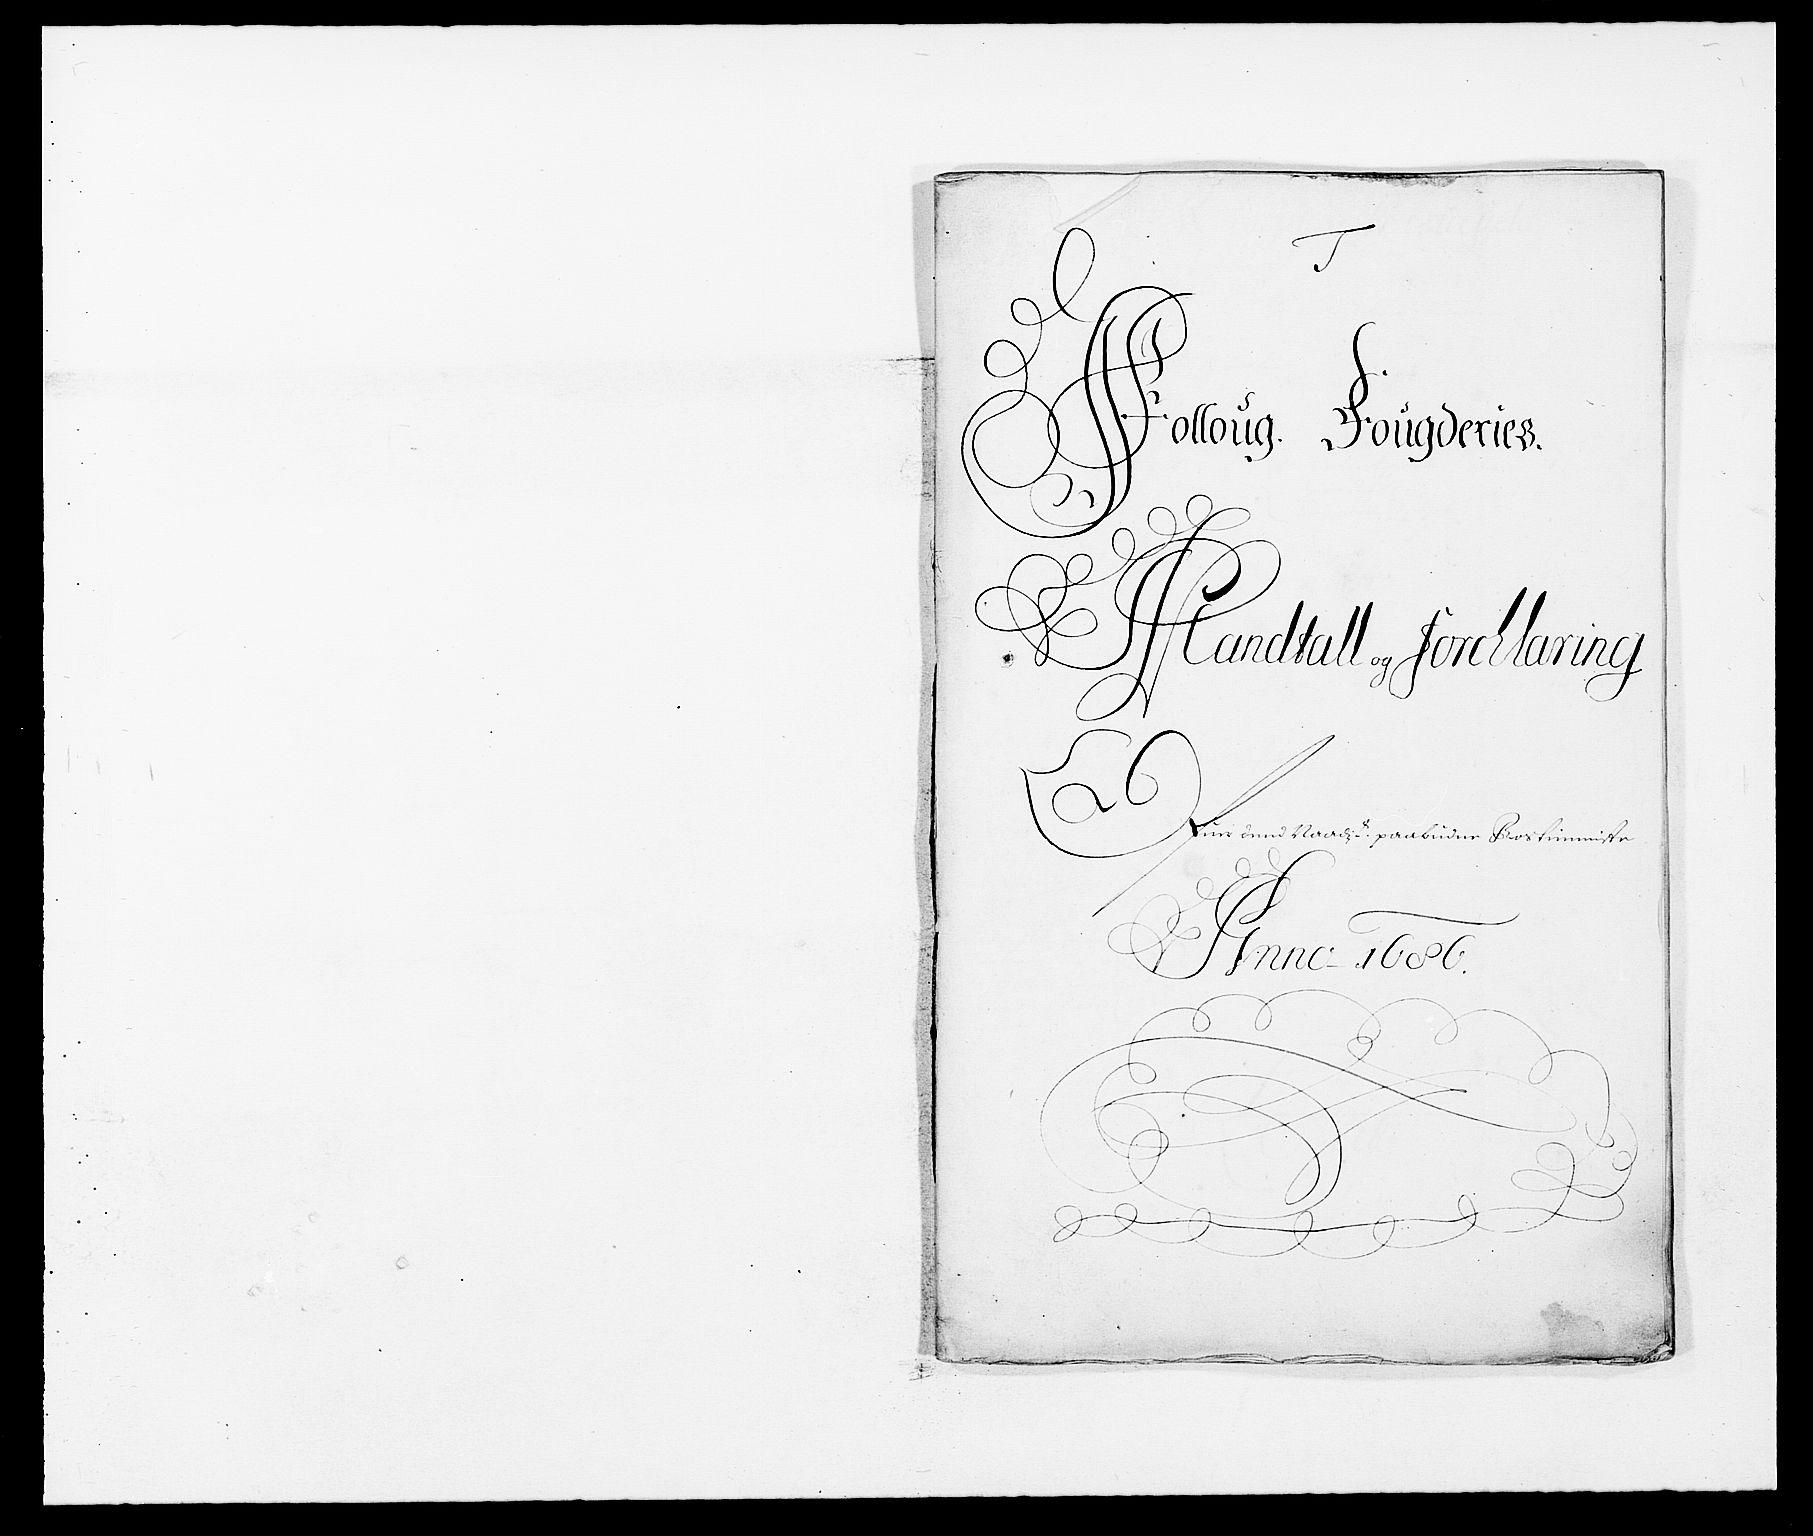 RA, Rentekammeret inntil 1814, Reviderte regnskaper, Fogderegnskap, R09/L0433: Fogderegnskap Follo, 1685-1686, s. 459